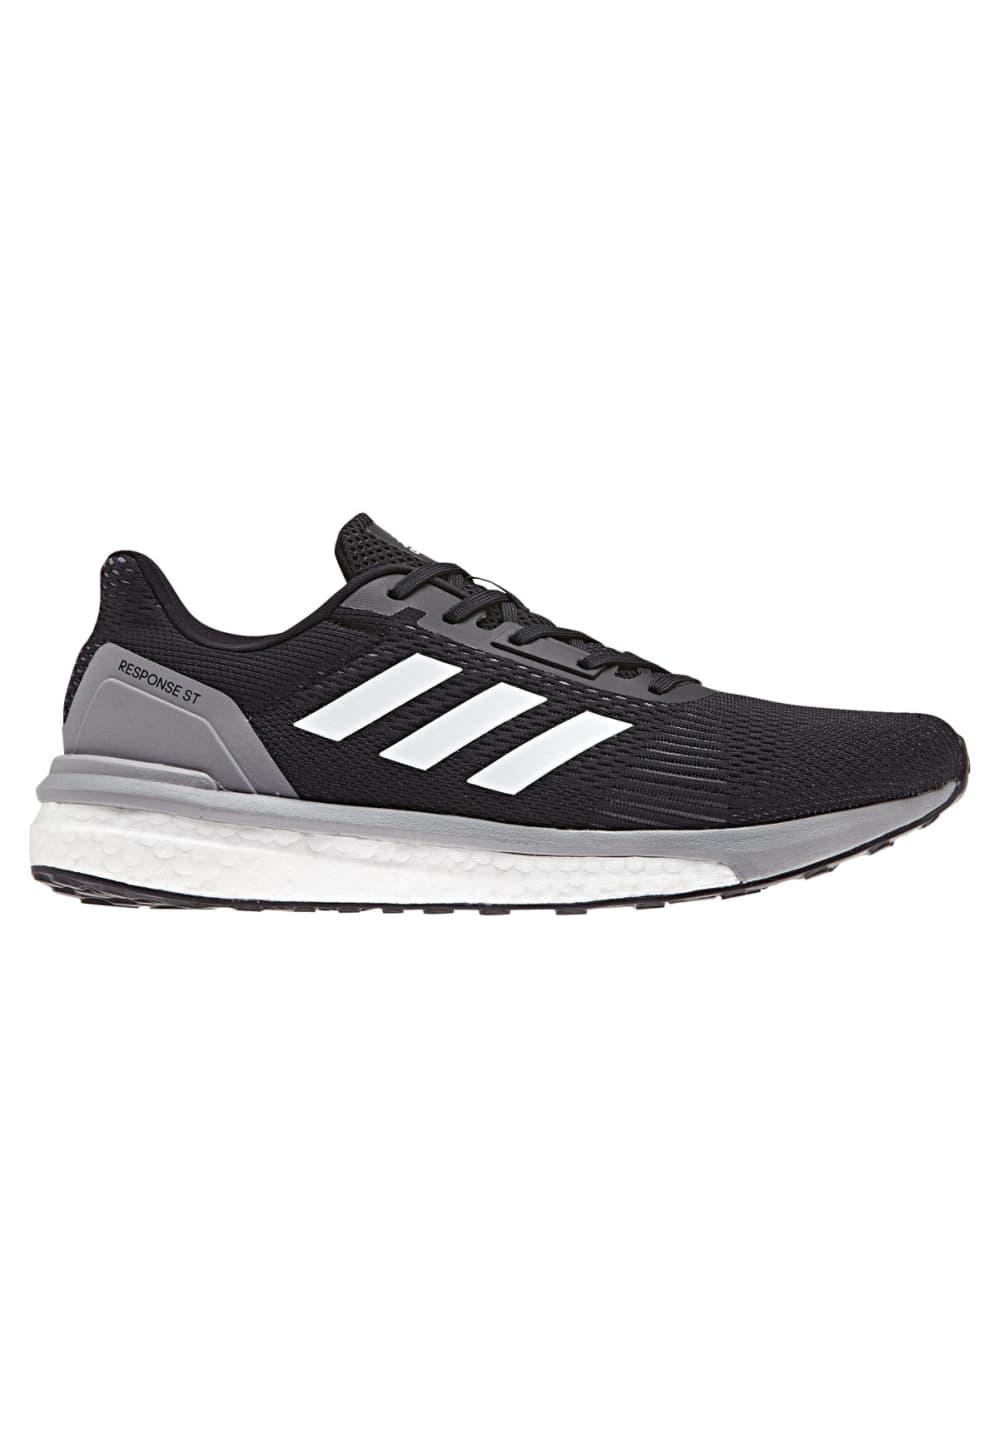 Adidas Running Response Homme Chaussures Pour St Noir 54Lj3AR